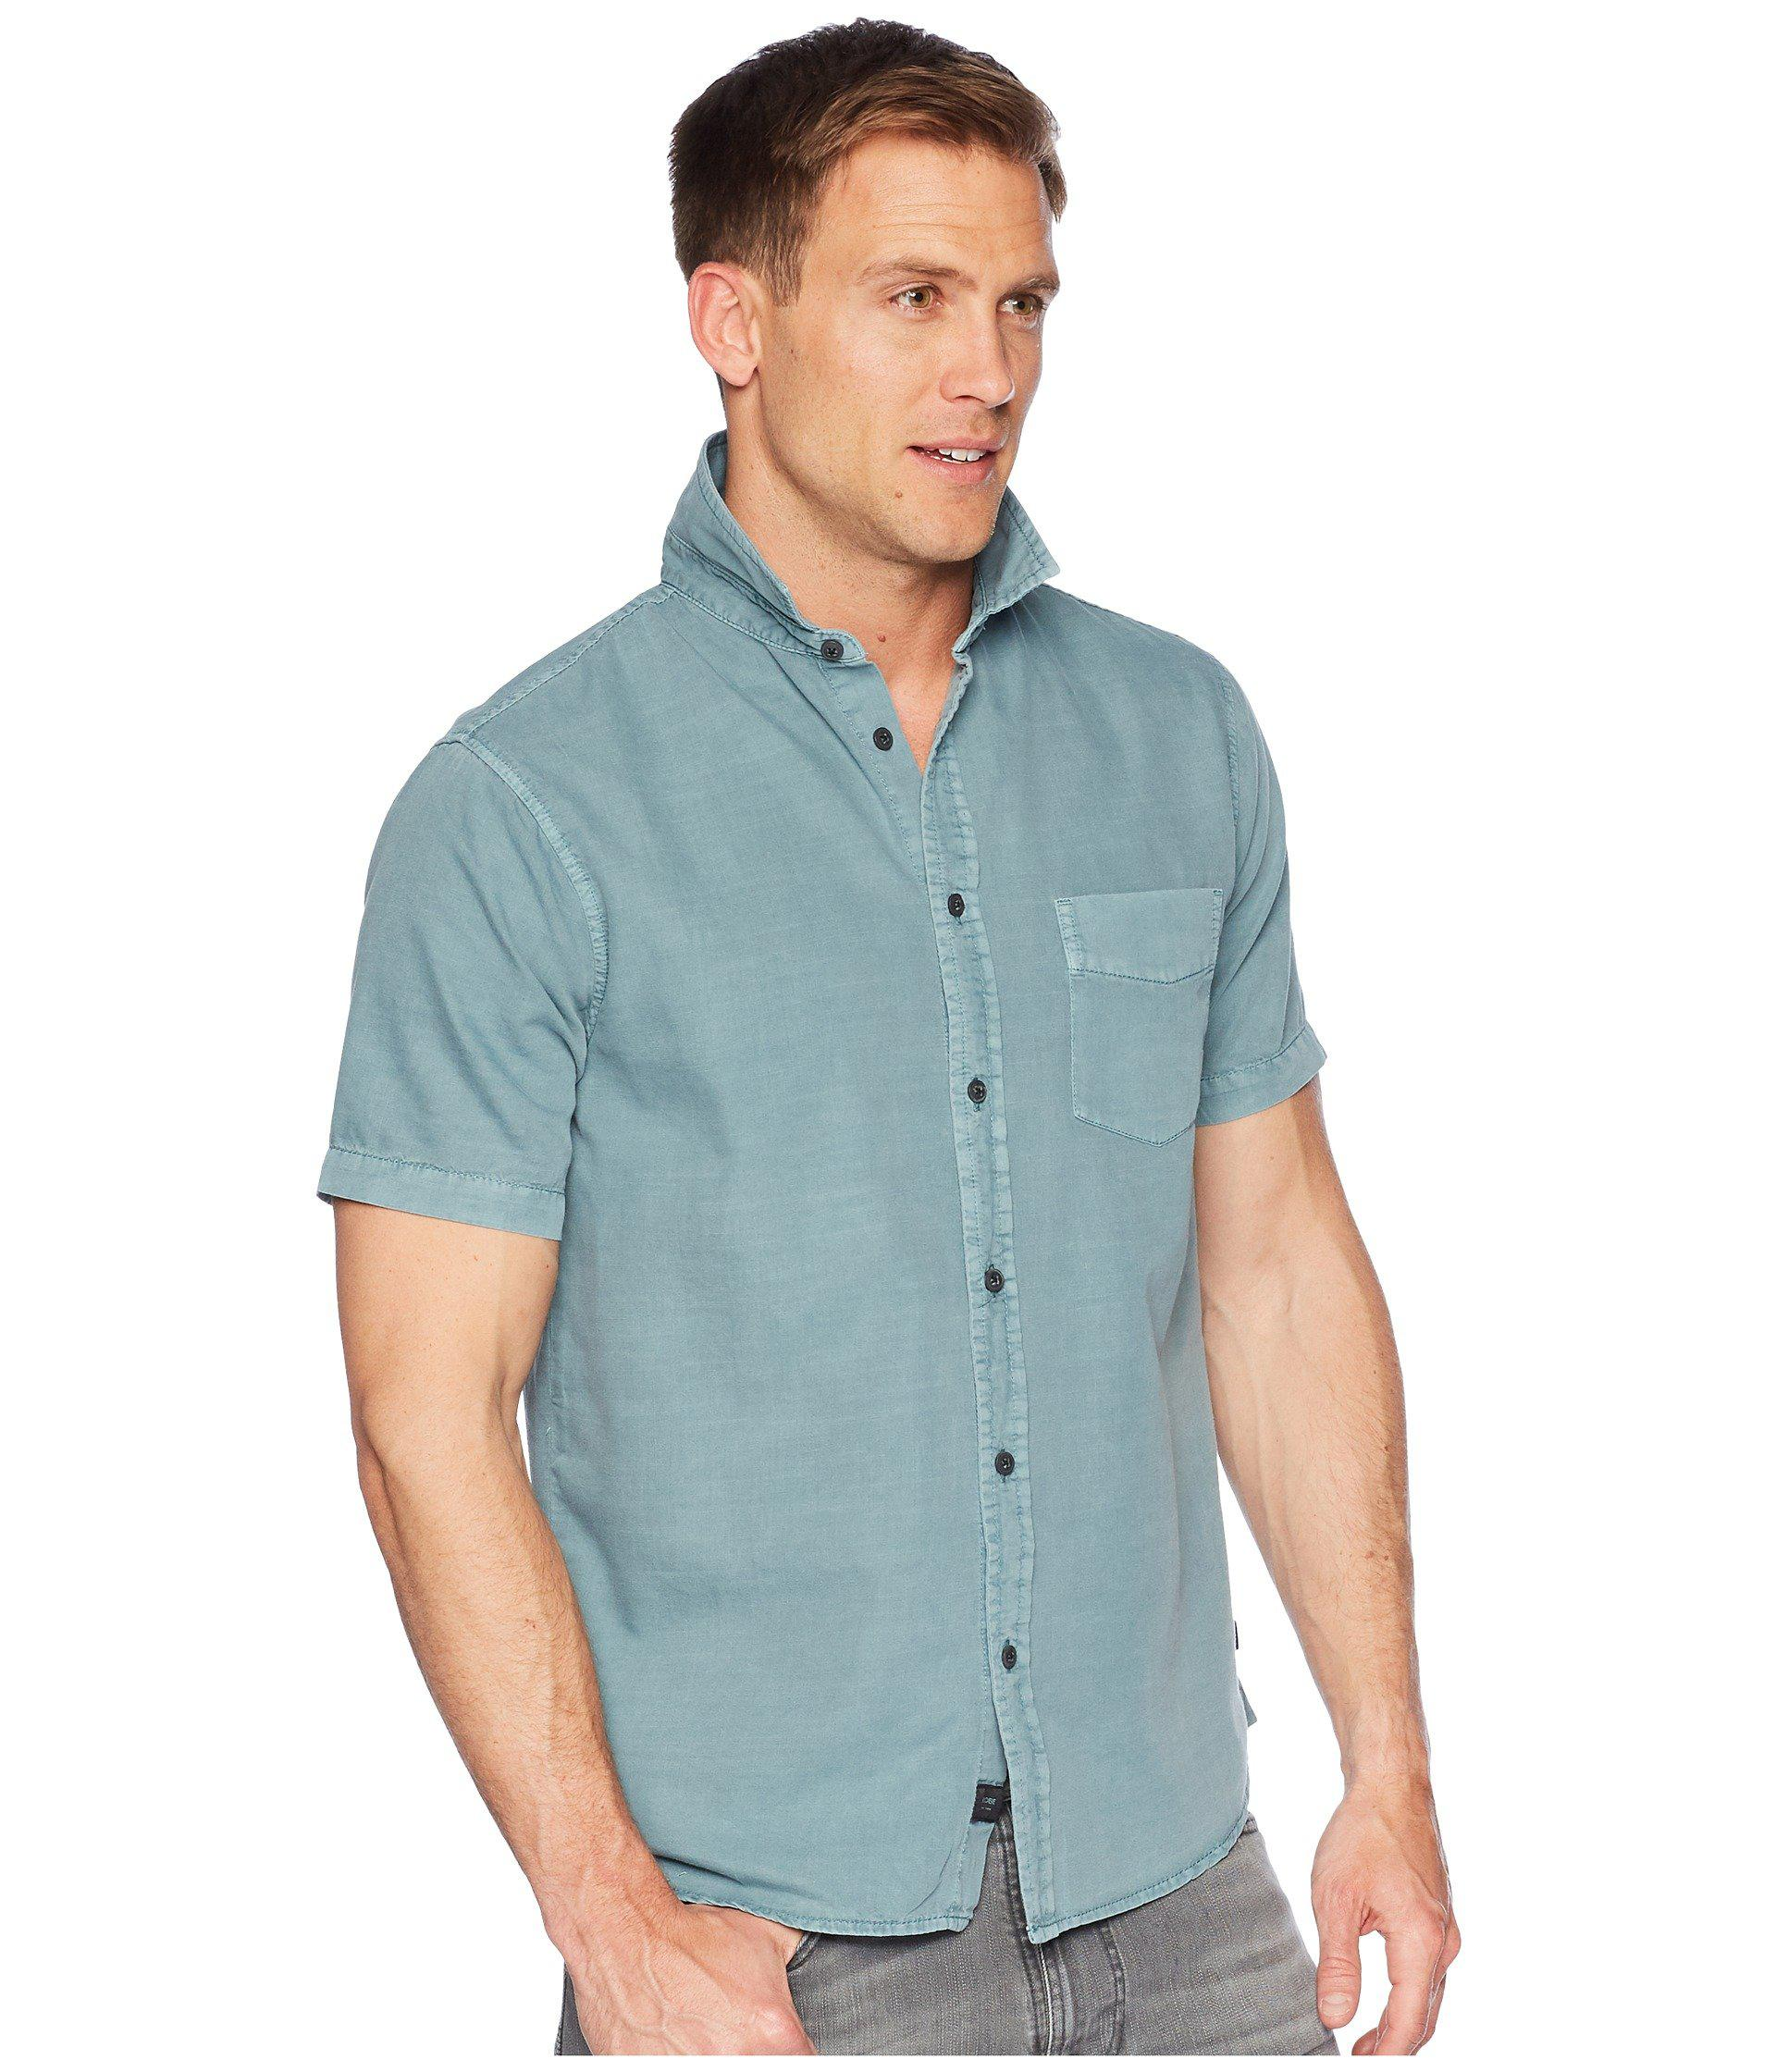 215ee933fc1 Lyst - Globe Goodstock Vintage Short Sleeve Shirt (dusty Coral ...